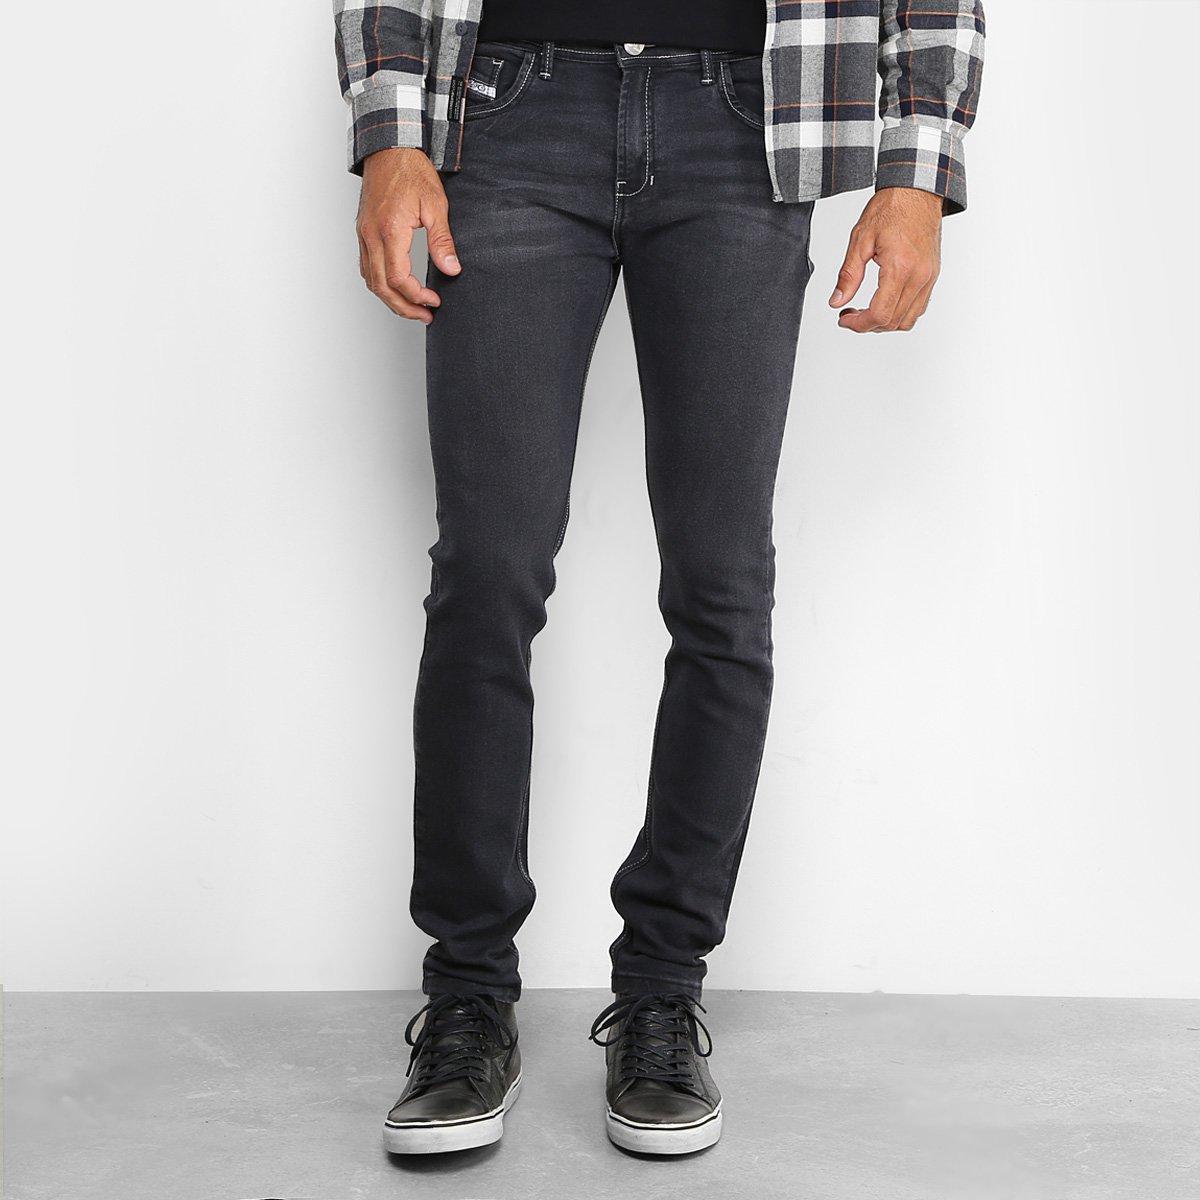 287a81e44 Calça Jeans Preston Classic Black Estonada Skinny Masculina